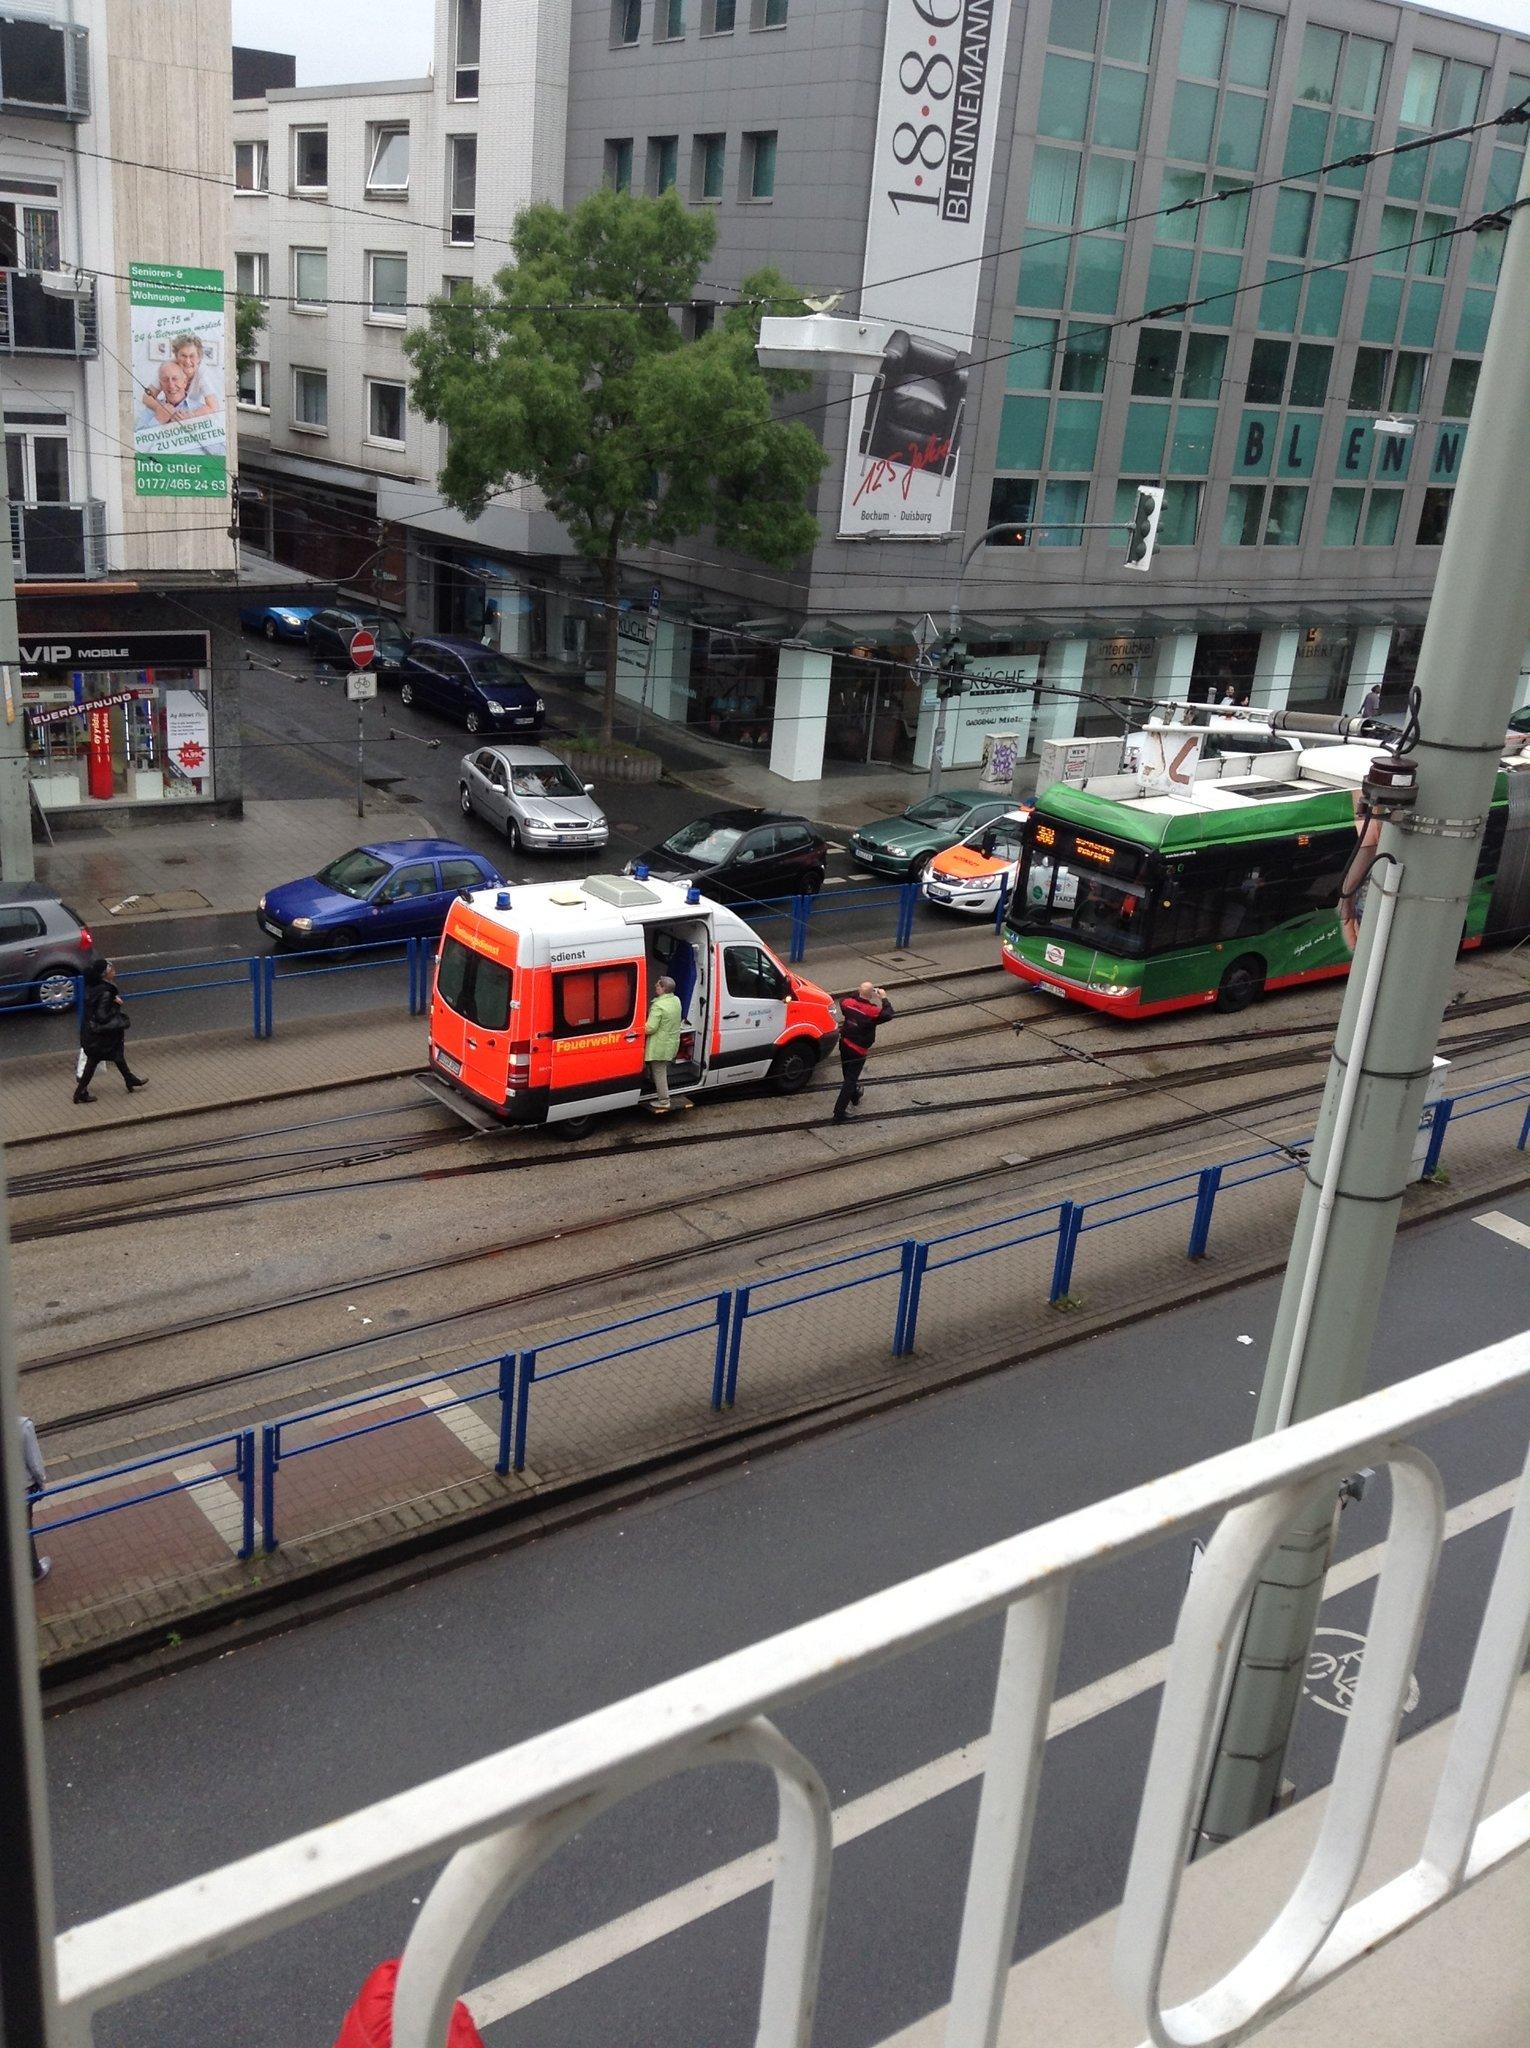 Blennemann Duisburg 13.6.2013 bochum brückstrasse - unfall - bochum